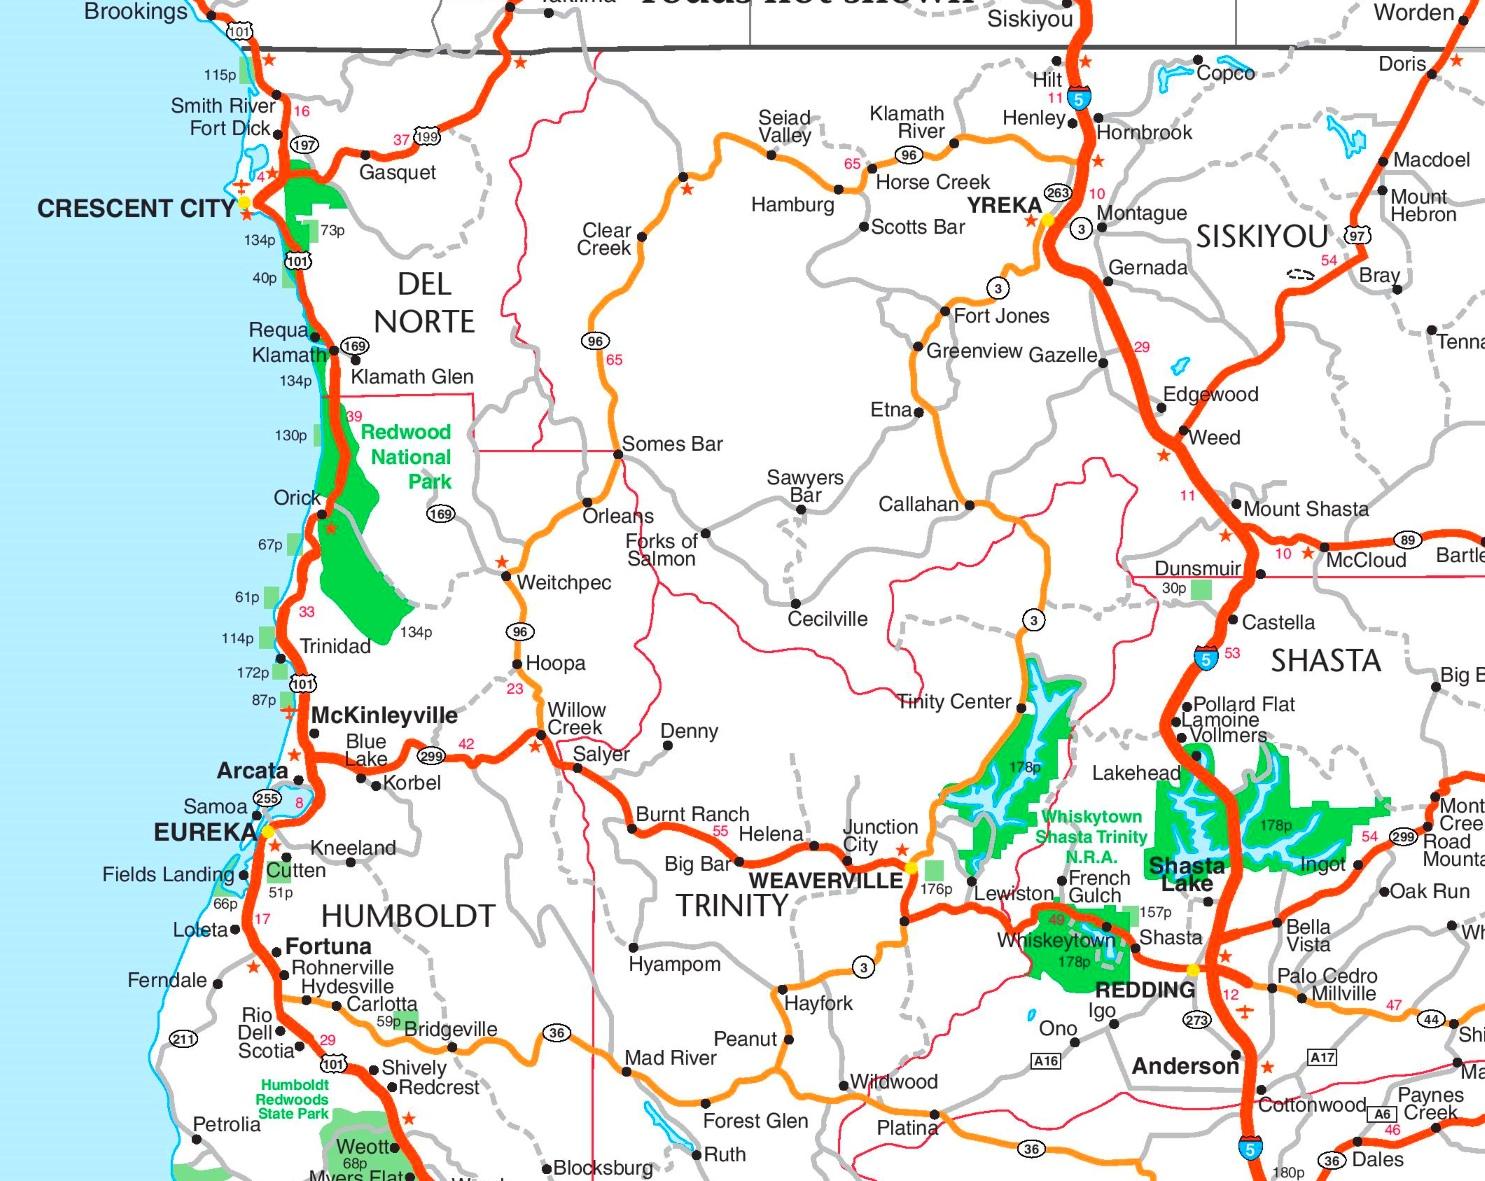 Redwood National Park Map Redwood National Park area road map Redwood National Park Map